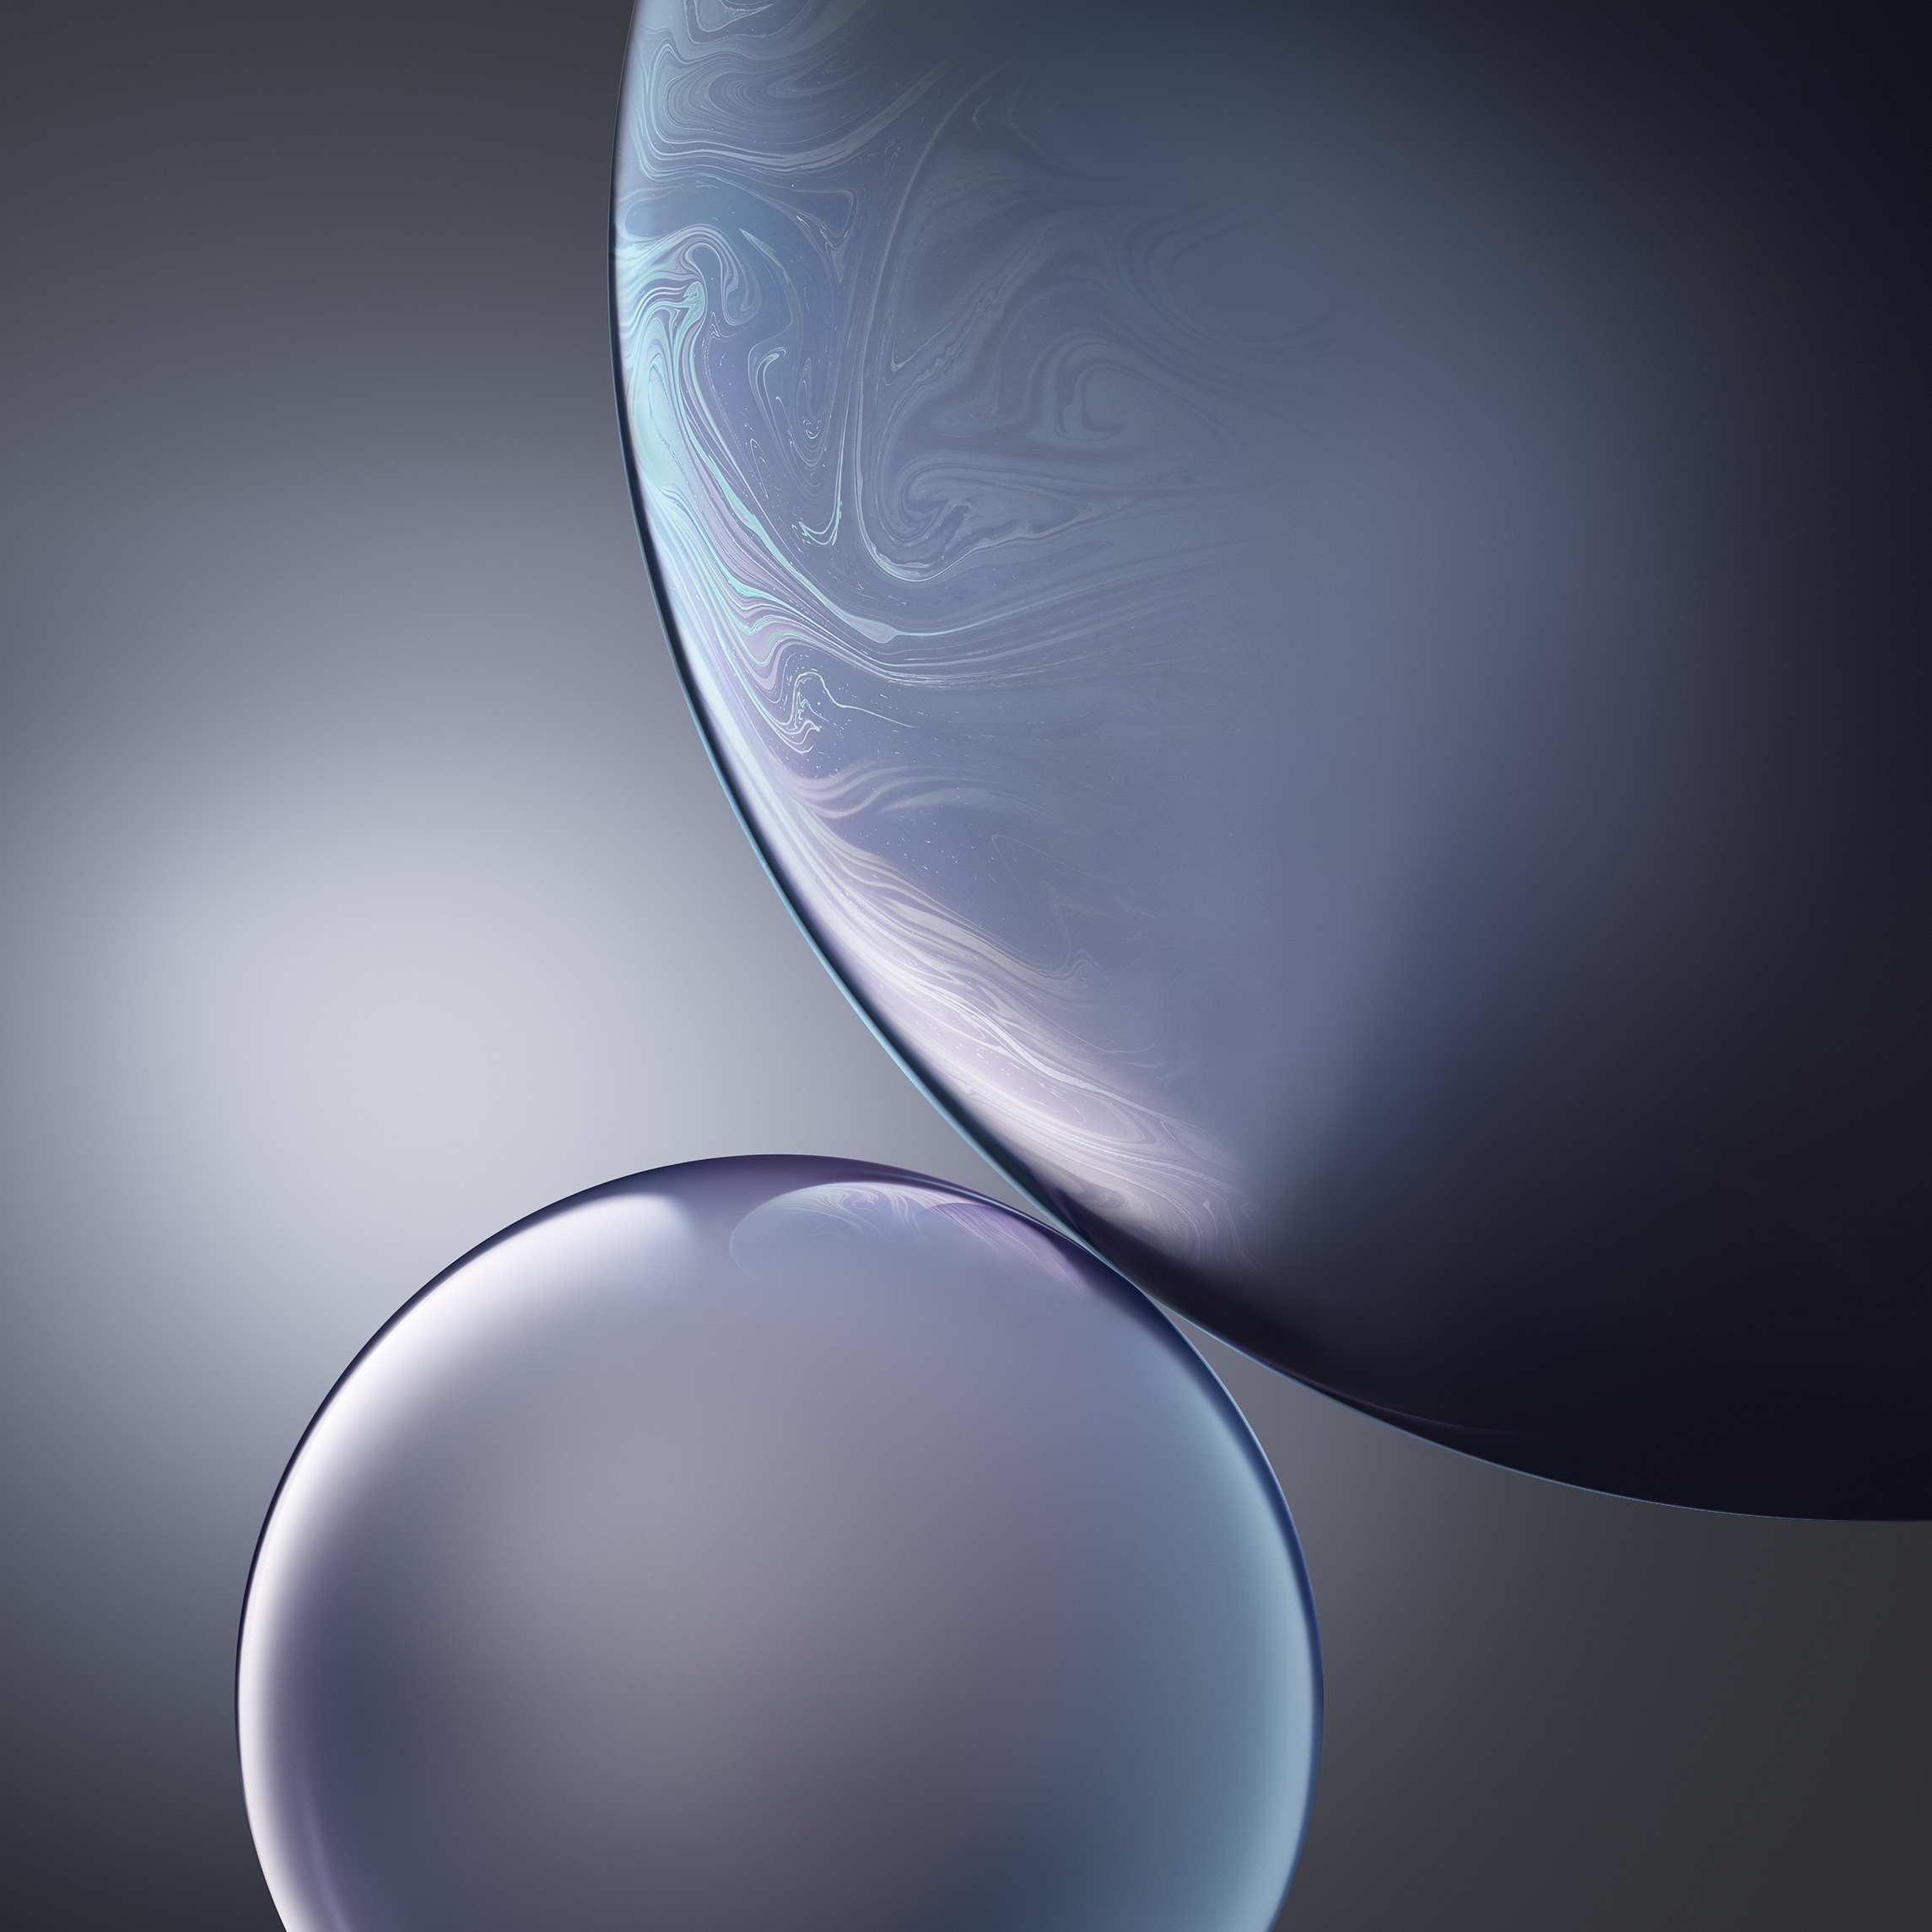 Doublebubble_white 414w 896h2xiphone